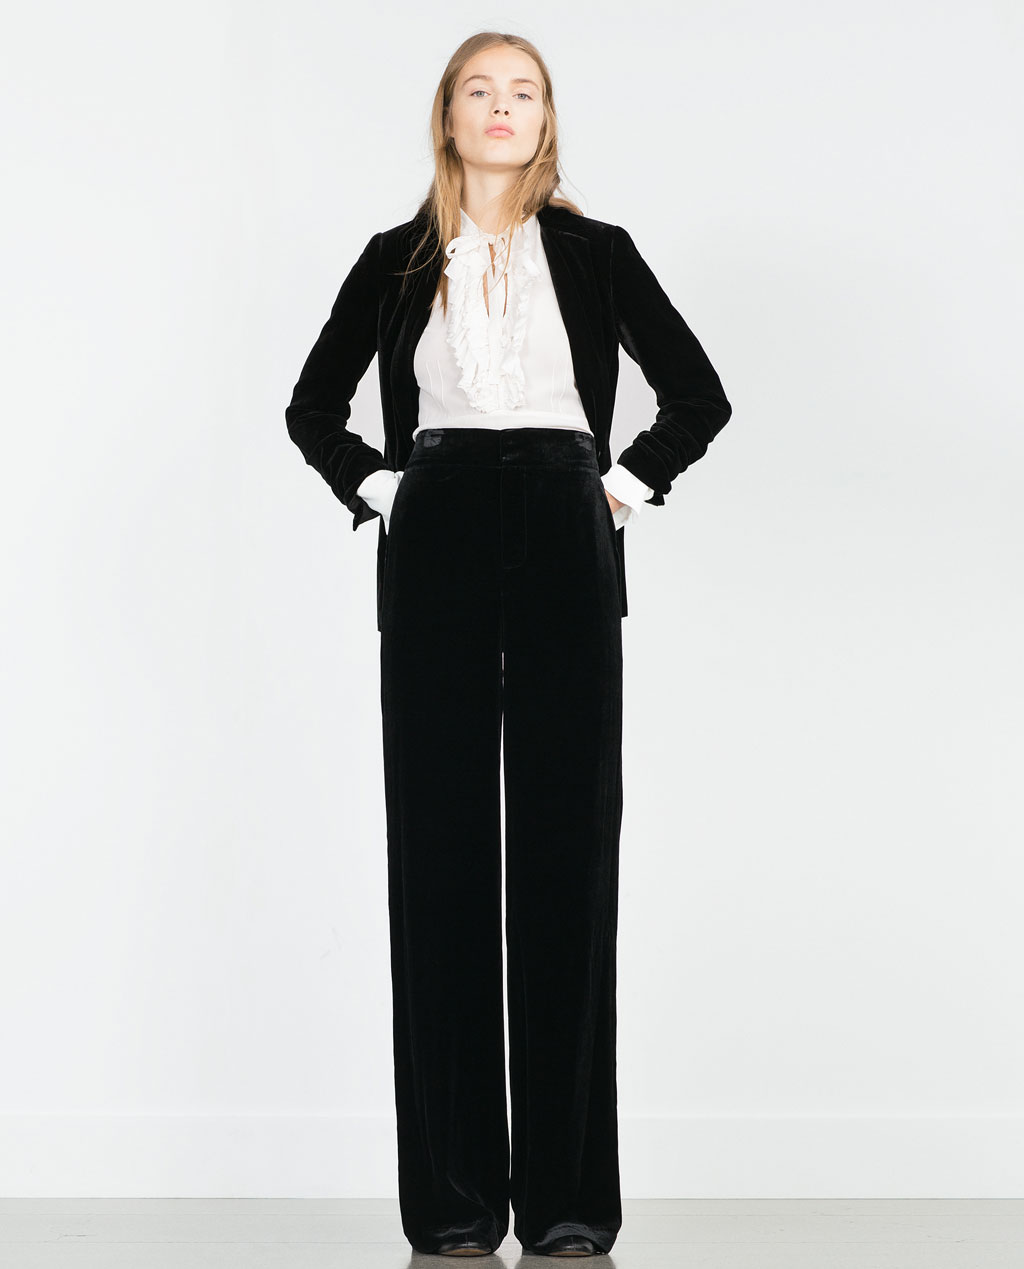 Zara - pantalon large